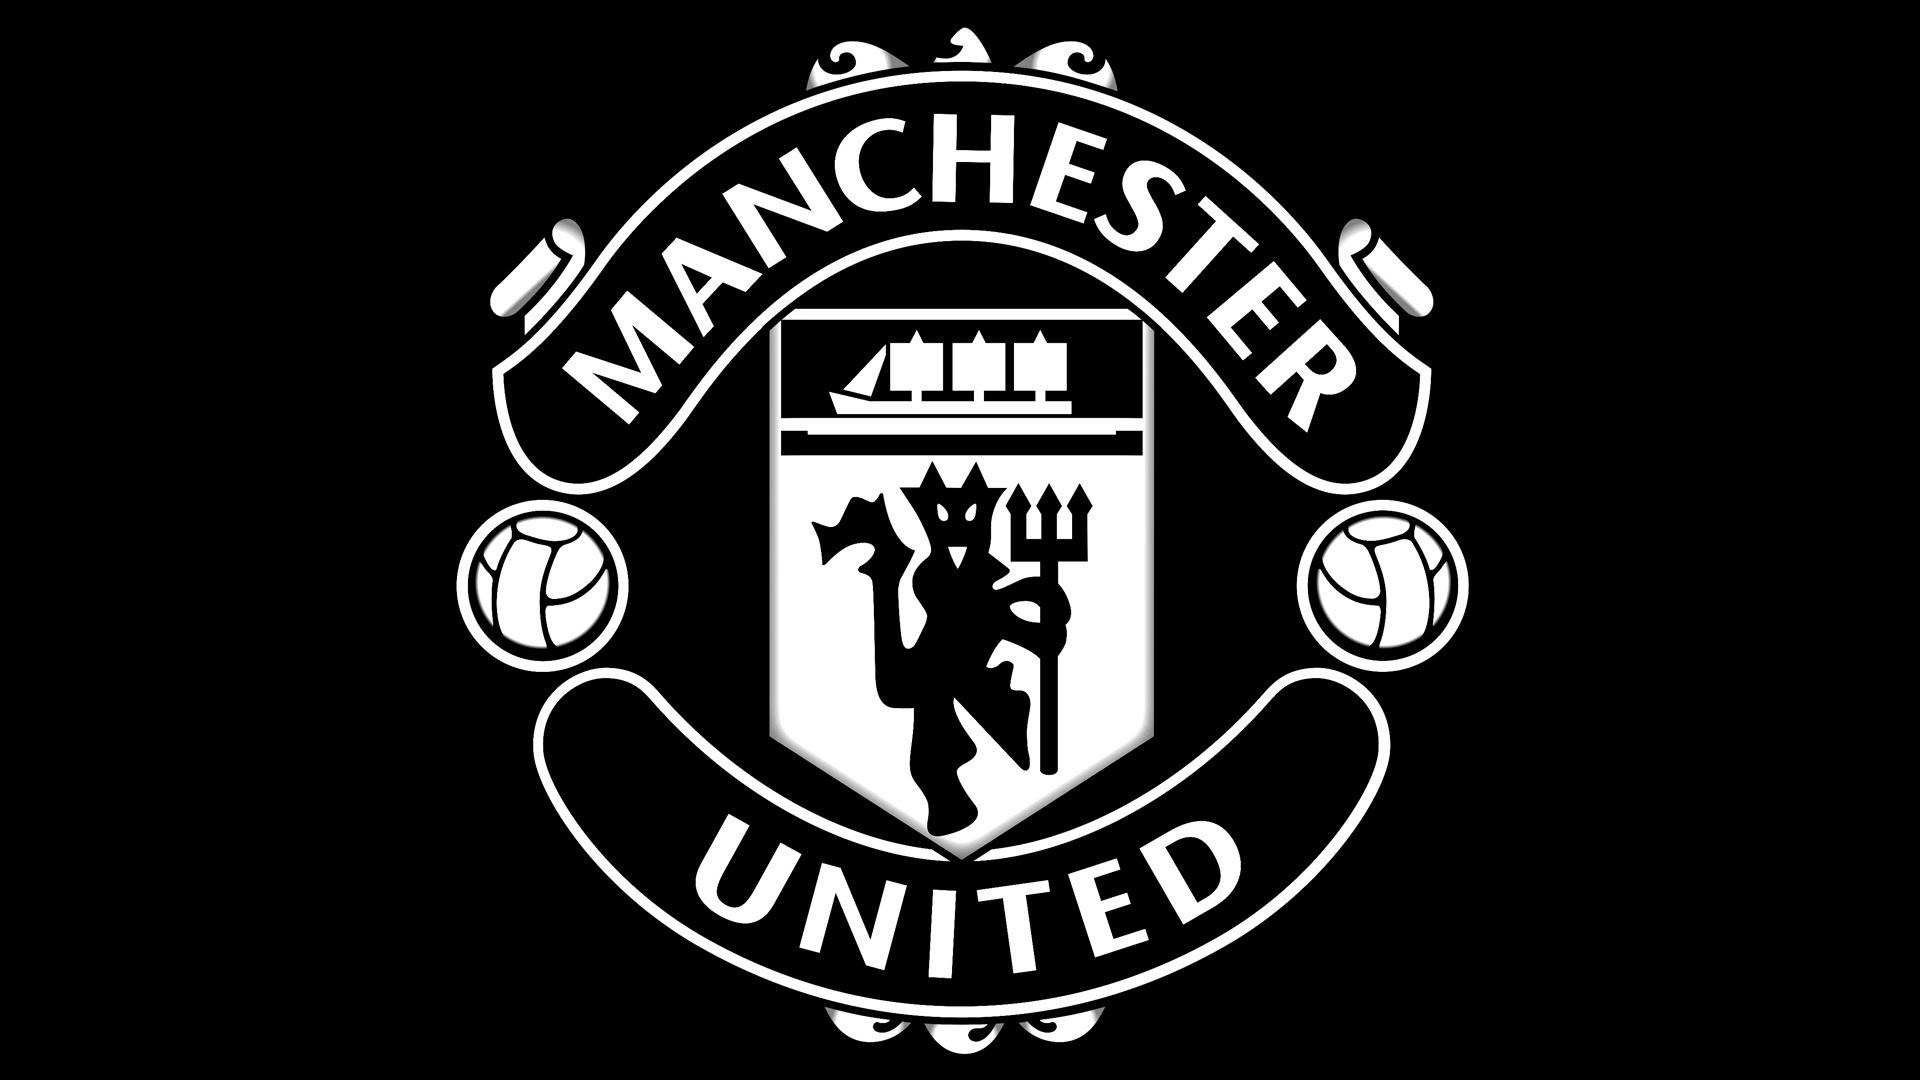 Manchester United logo histoire et signification ...